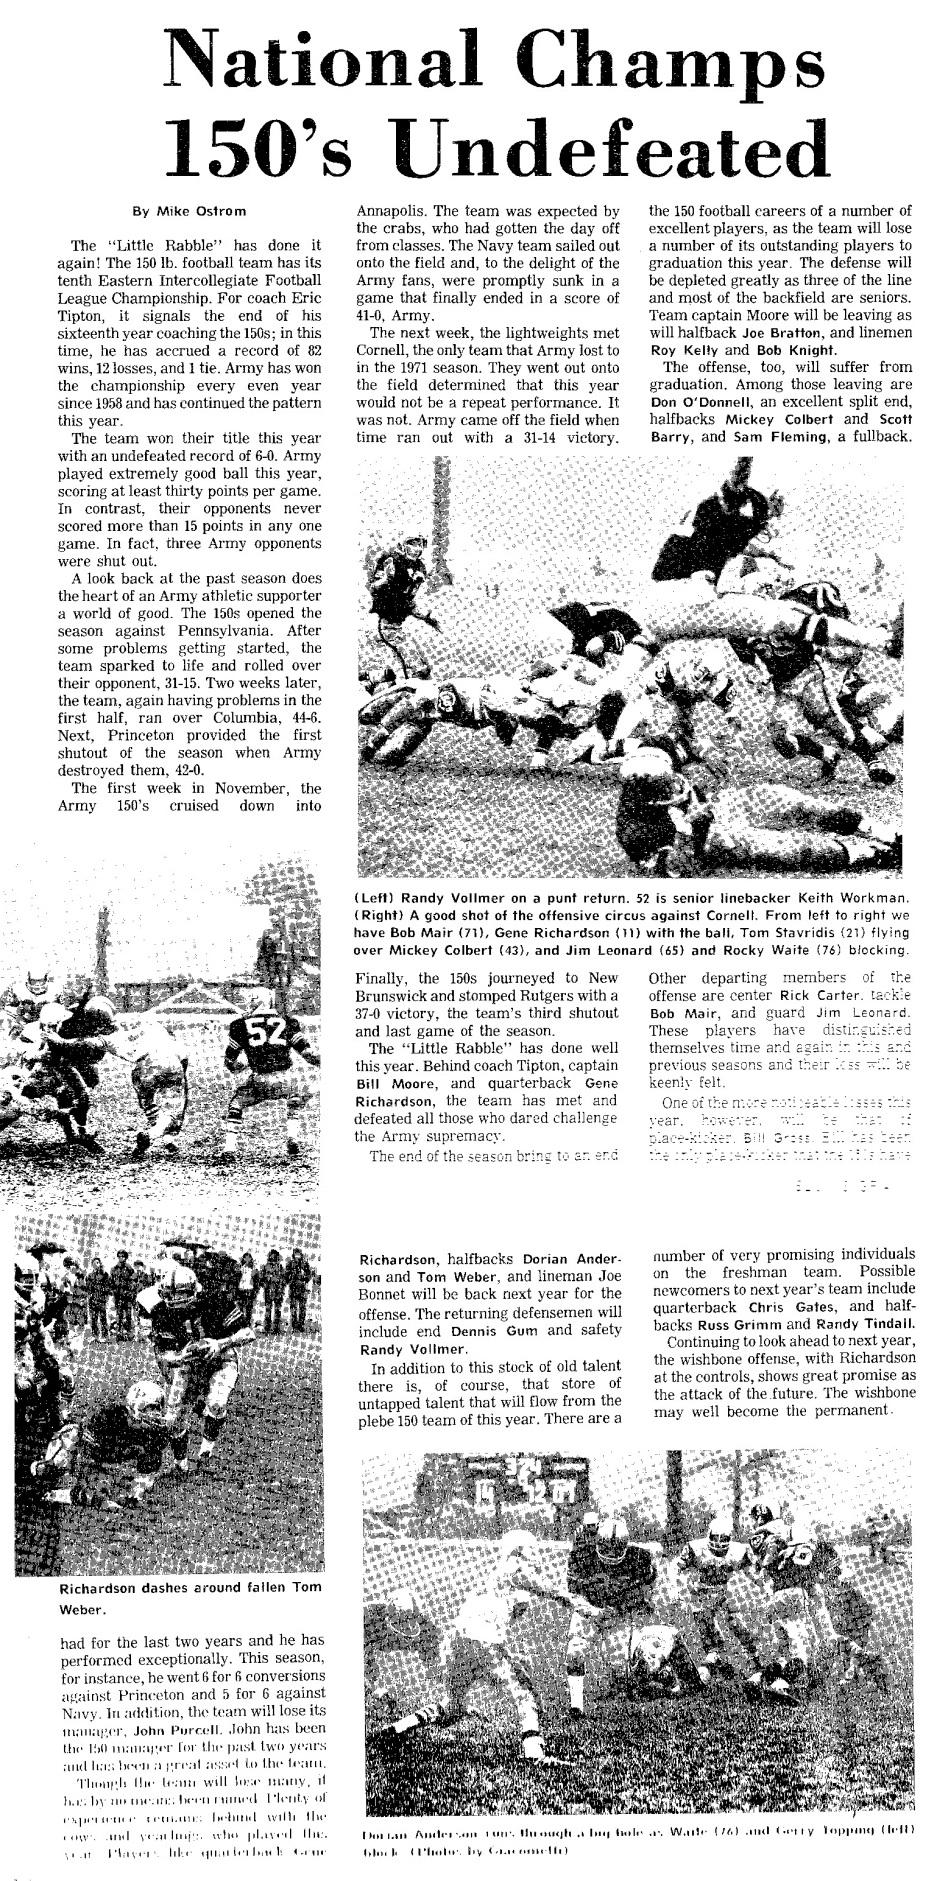 ArmyLFB_1972_112372_SlumnnGravy_Champions